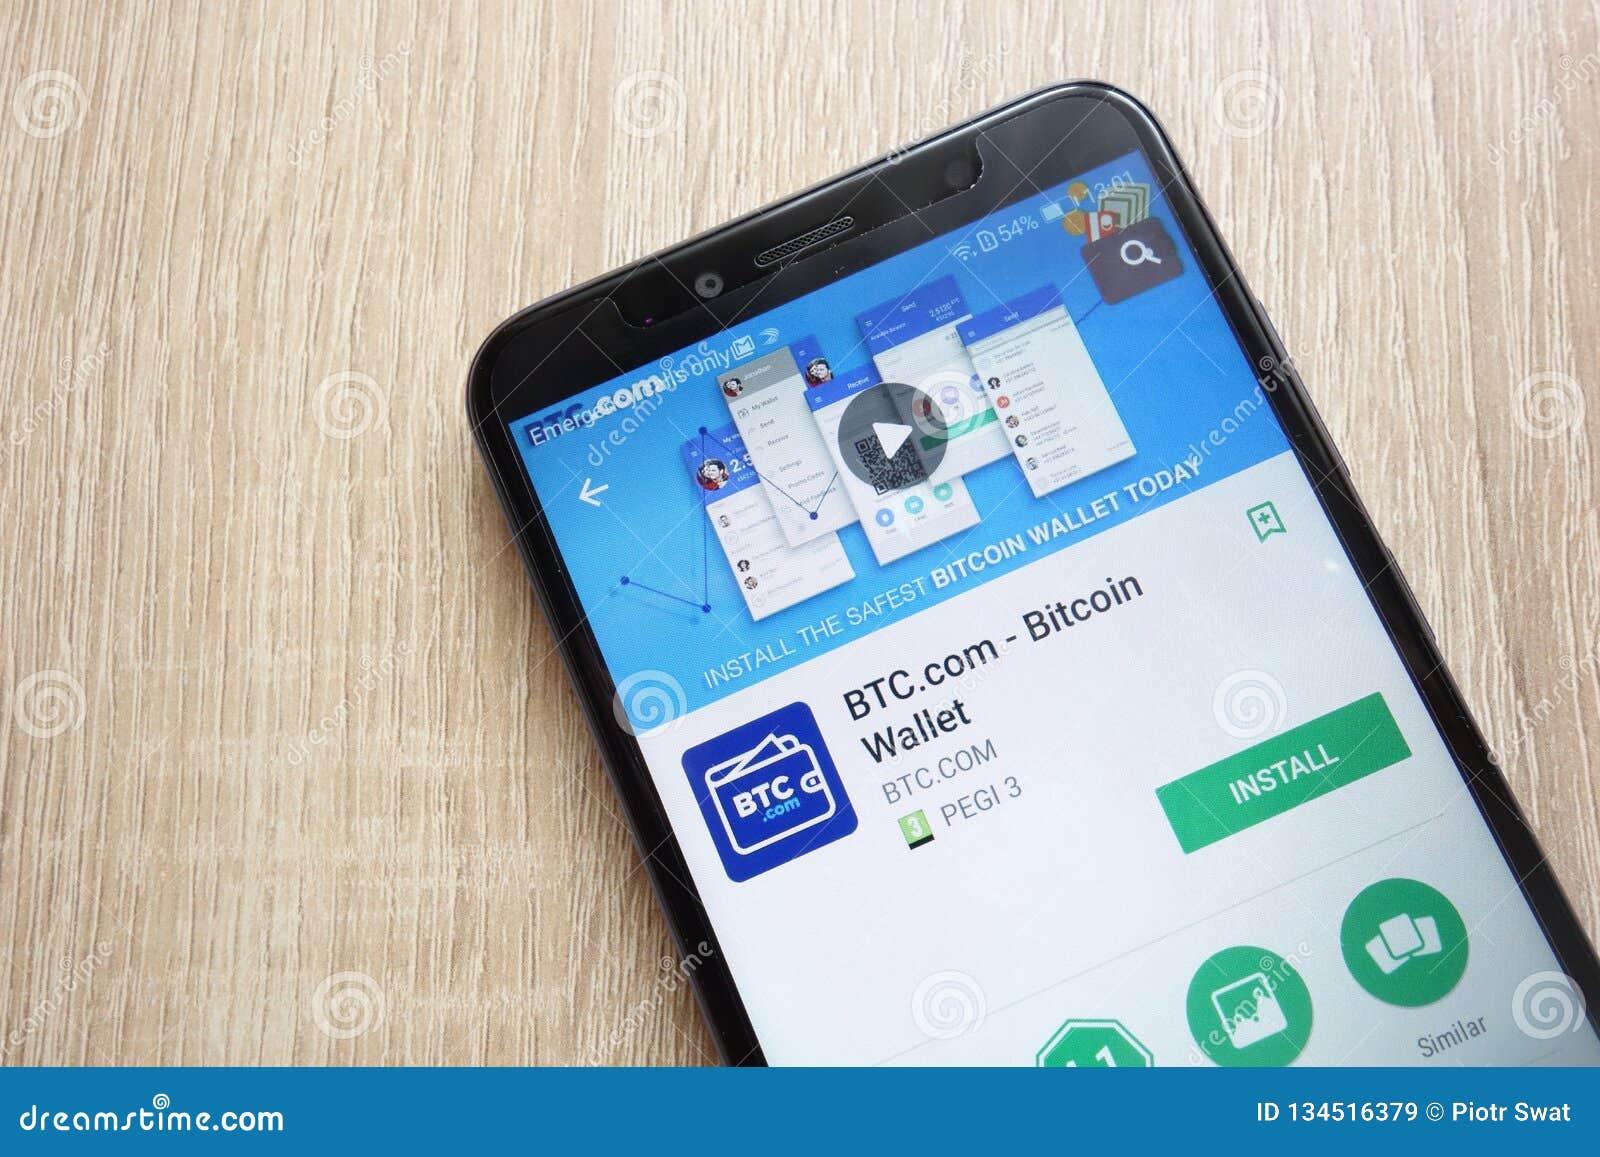 BTC com - Bitcoin Wallet App On Google Play Store Website